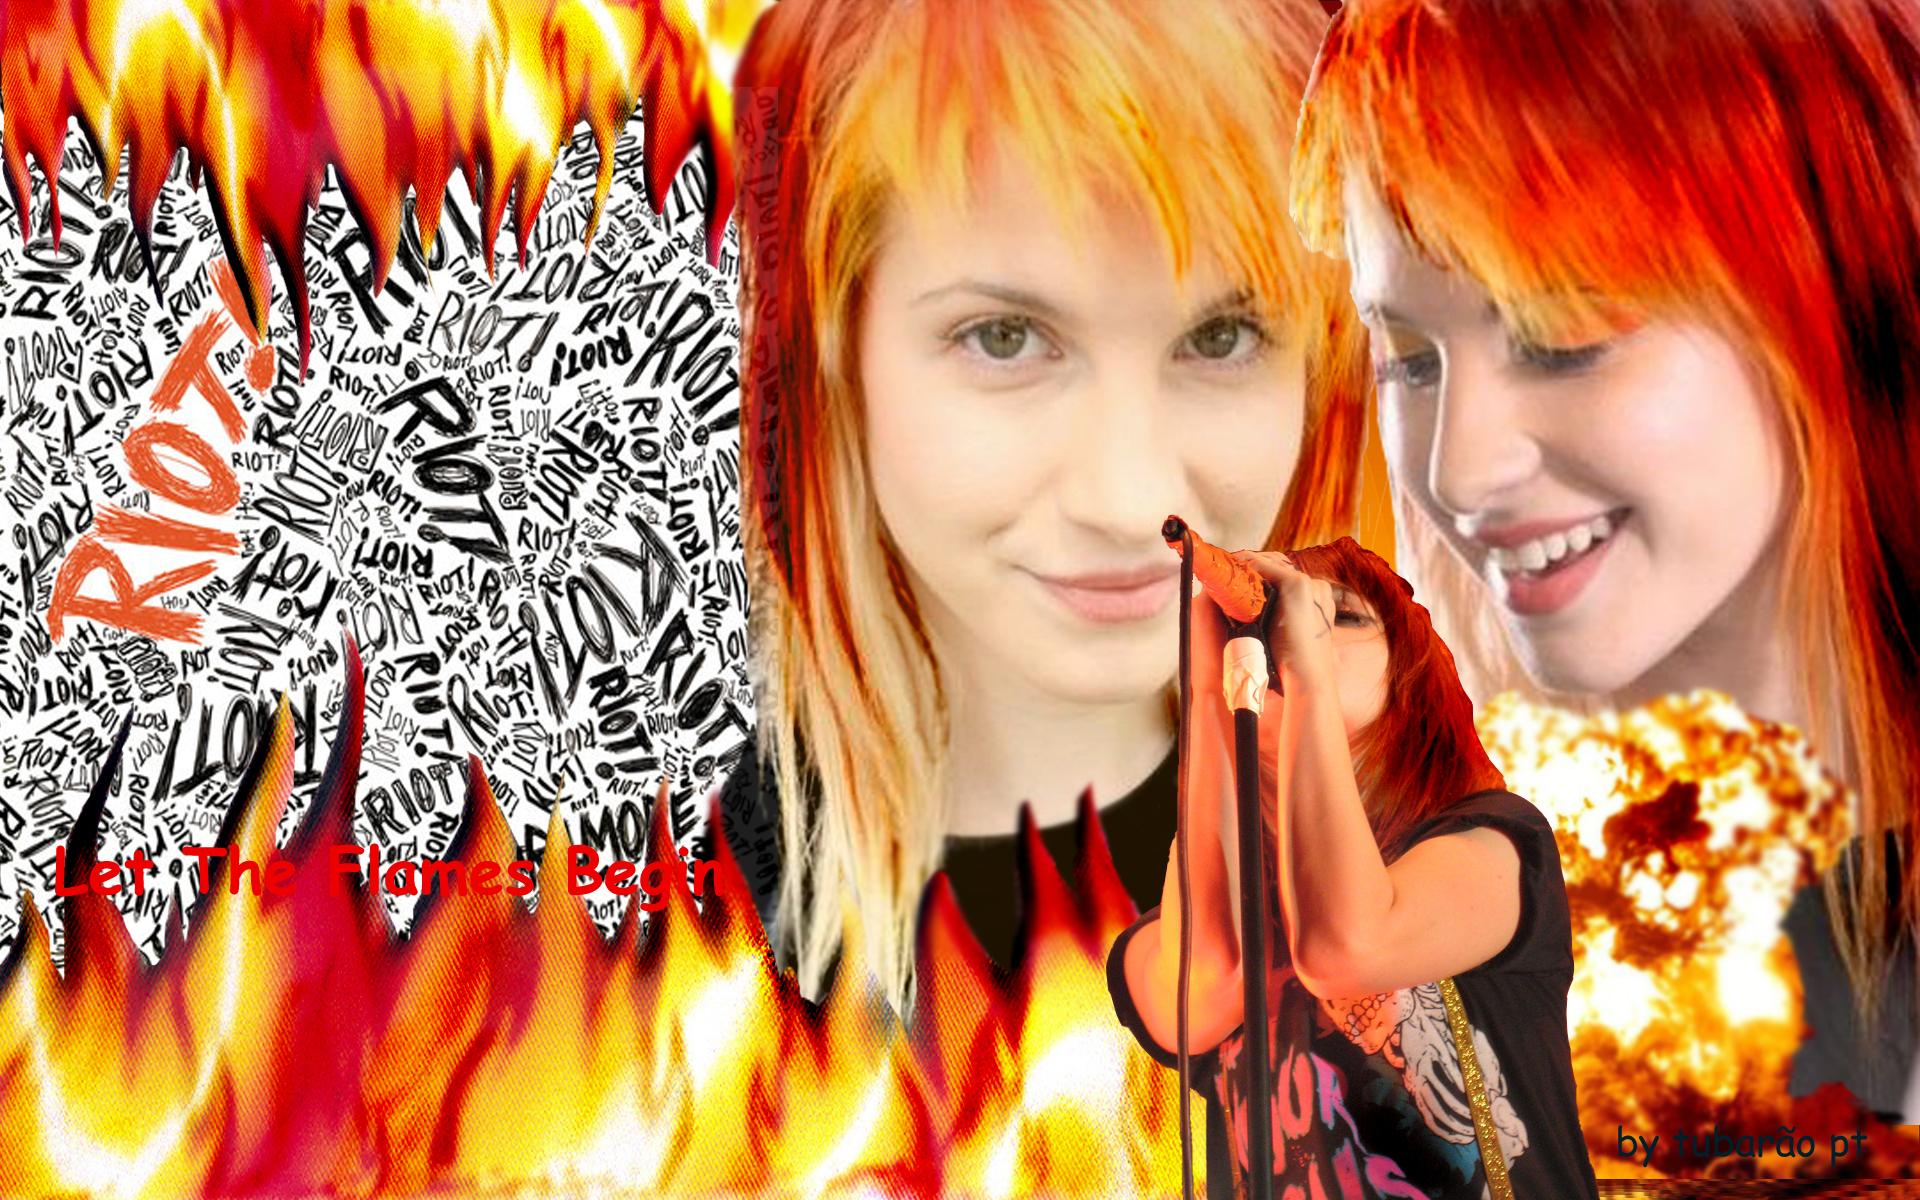 paramore - Paramore Wallpaper (1251545) - Fanpop